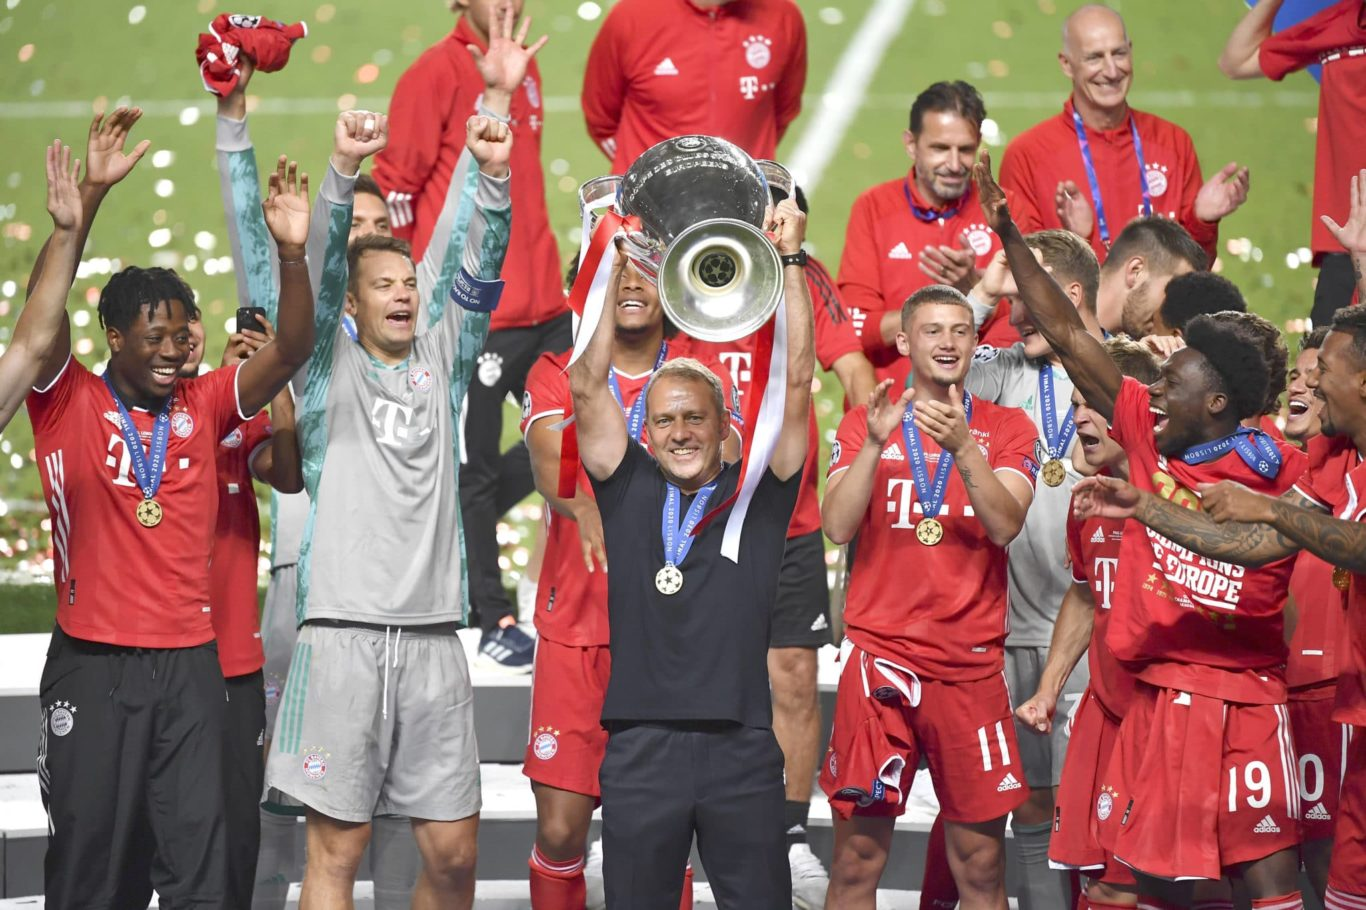 Fussball Champions League/ Finale/ Paris St. Germain - Bayern Muenchen Siegerehrung | Bild: Frank Hoermann/ SVEN SIMON / imagoImages